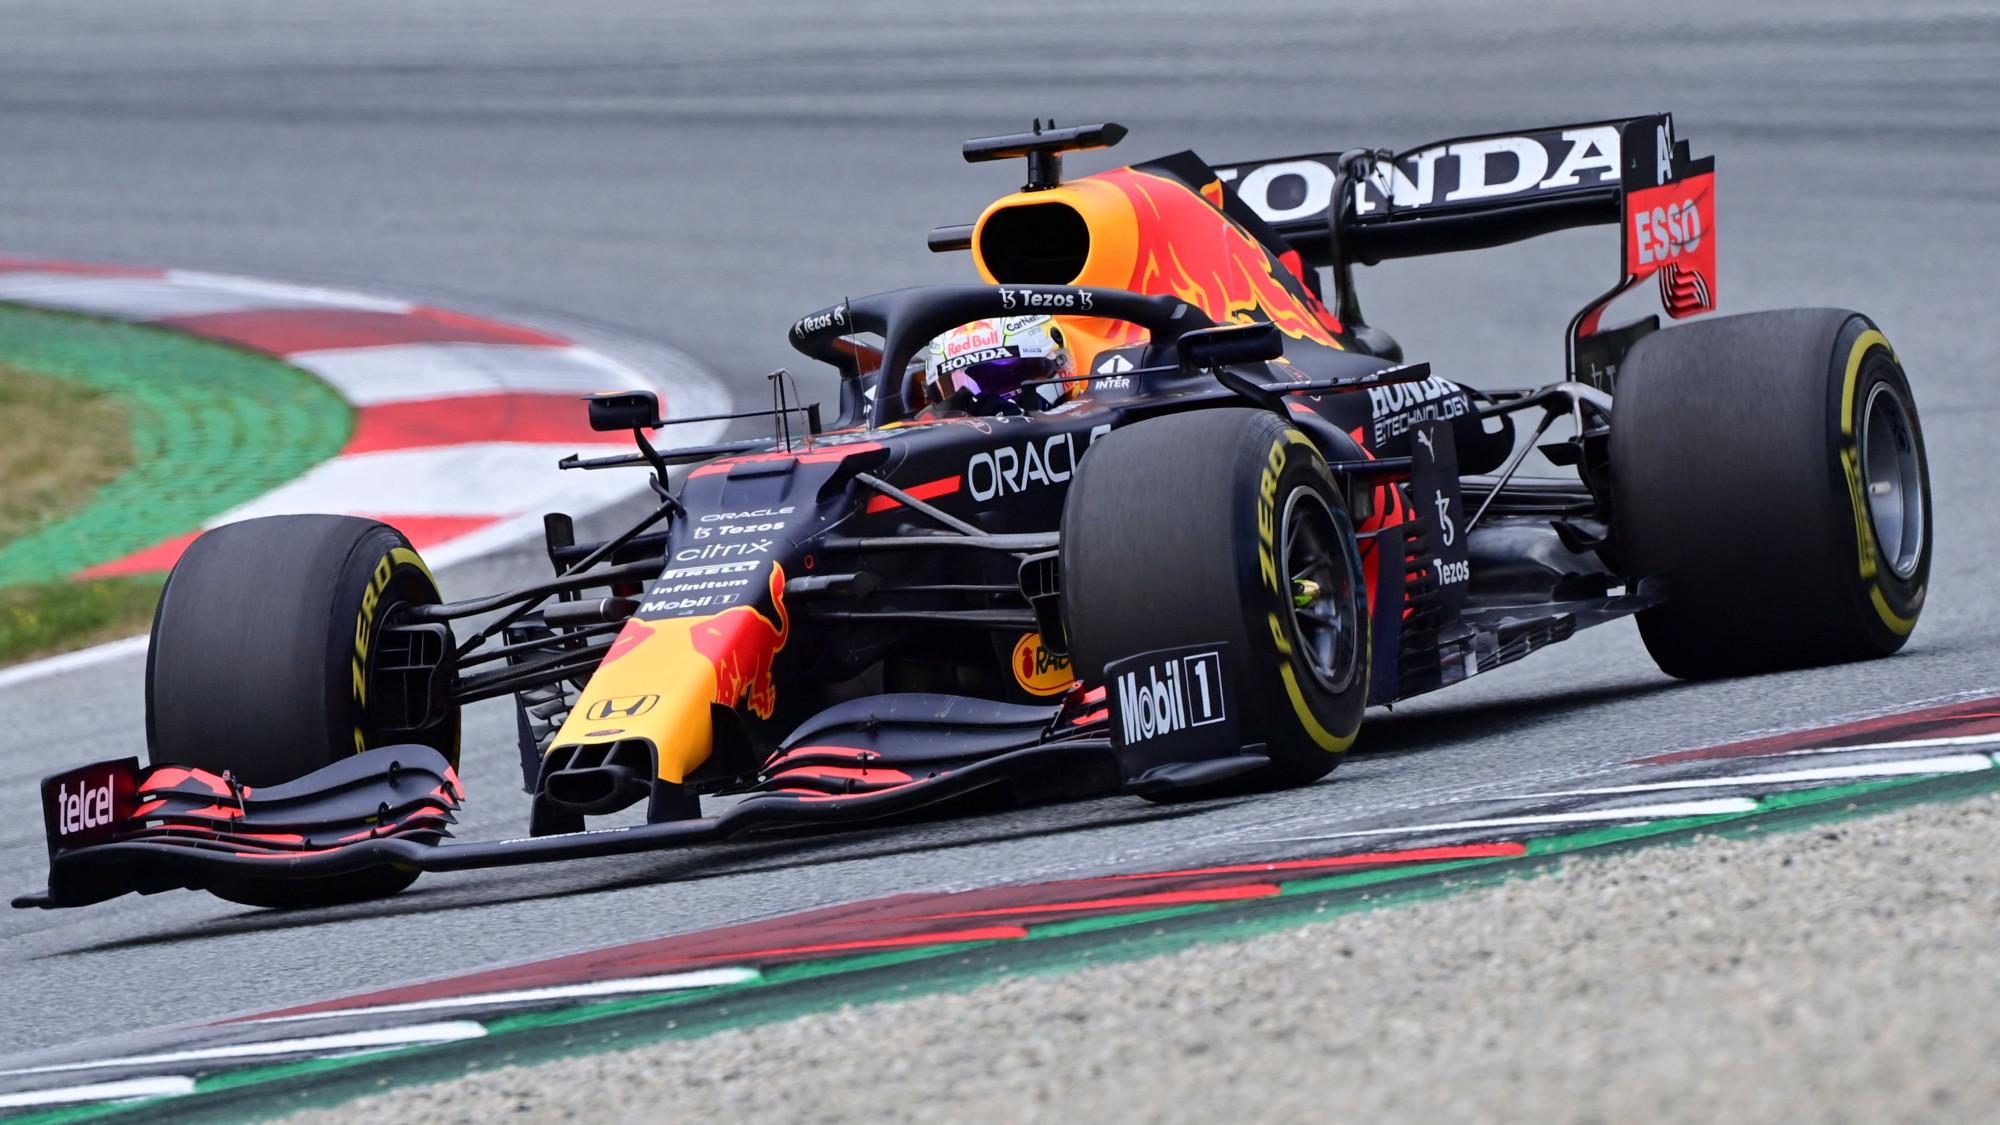 Max Verstappen, 2021 Austrian GP